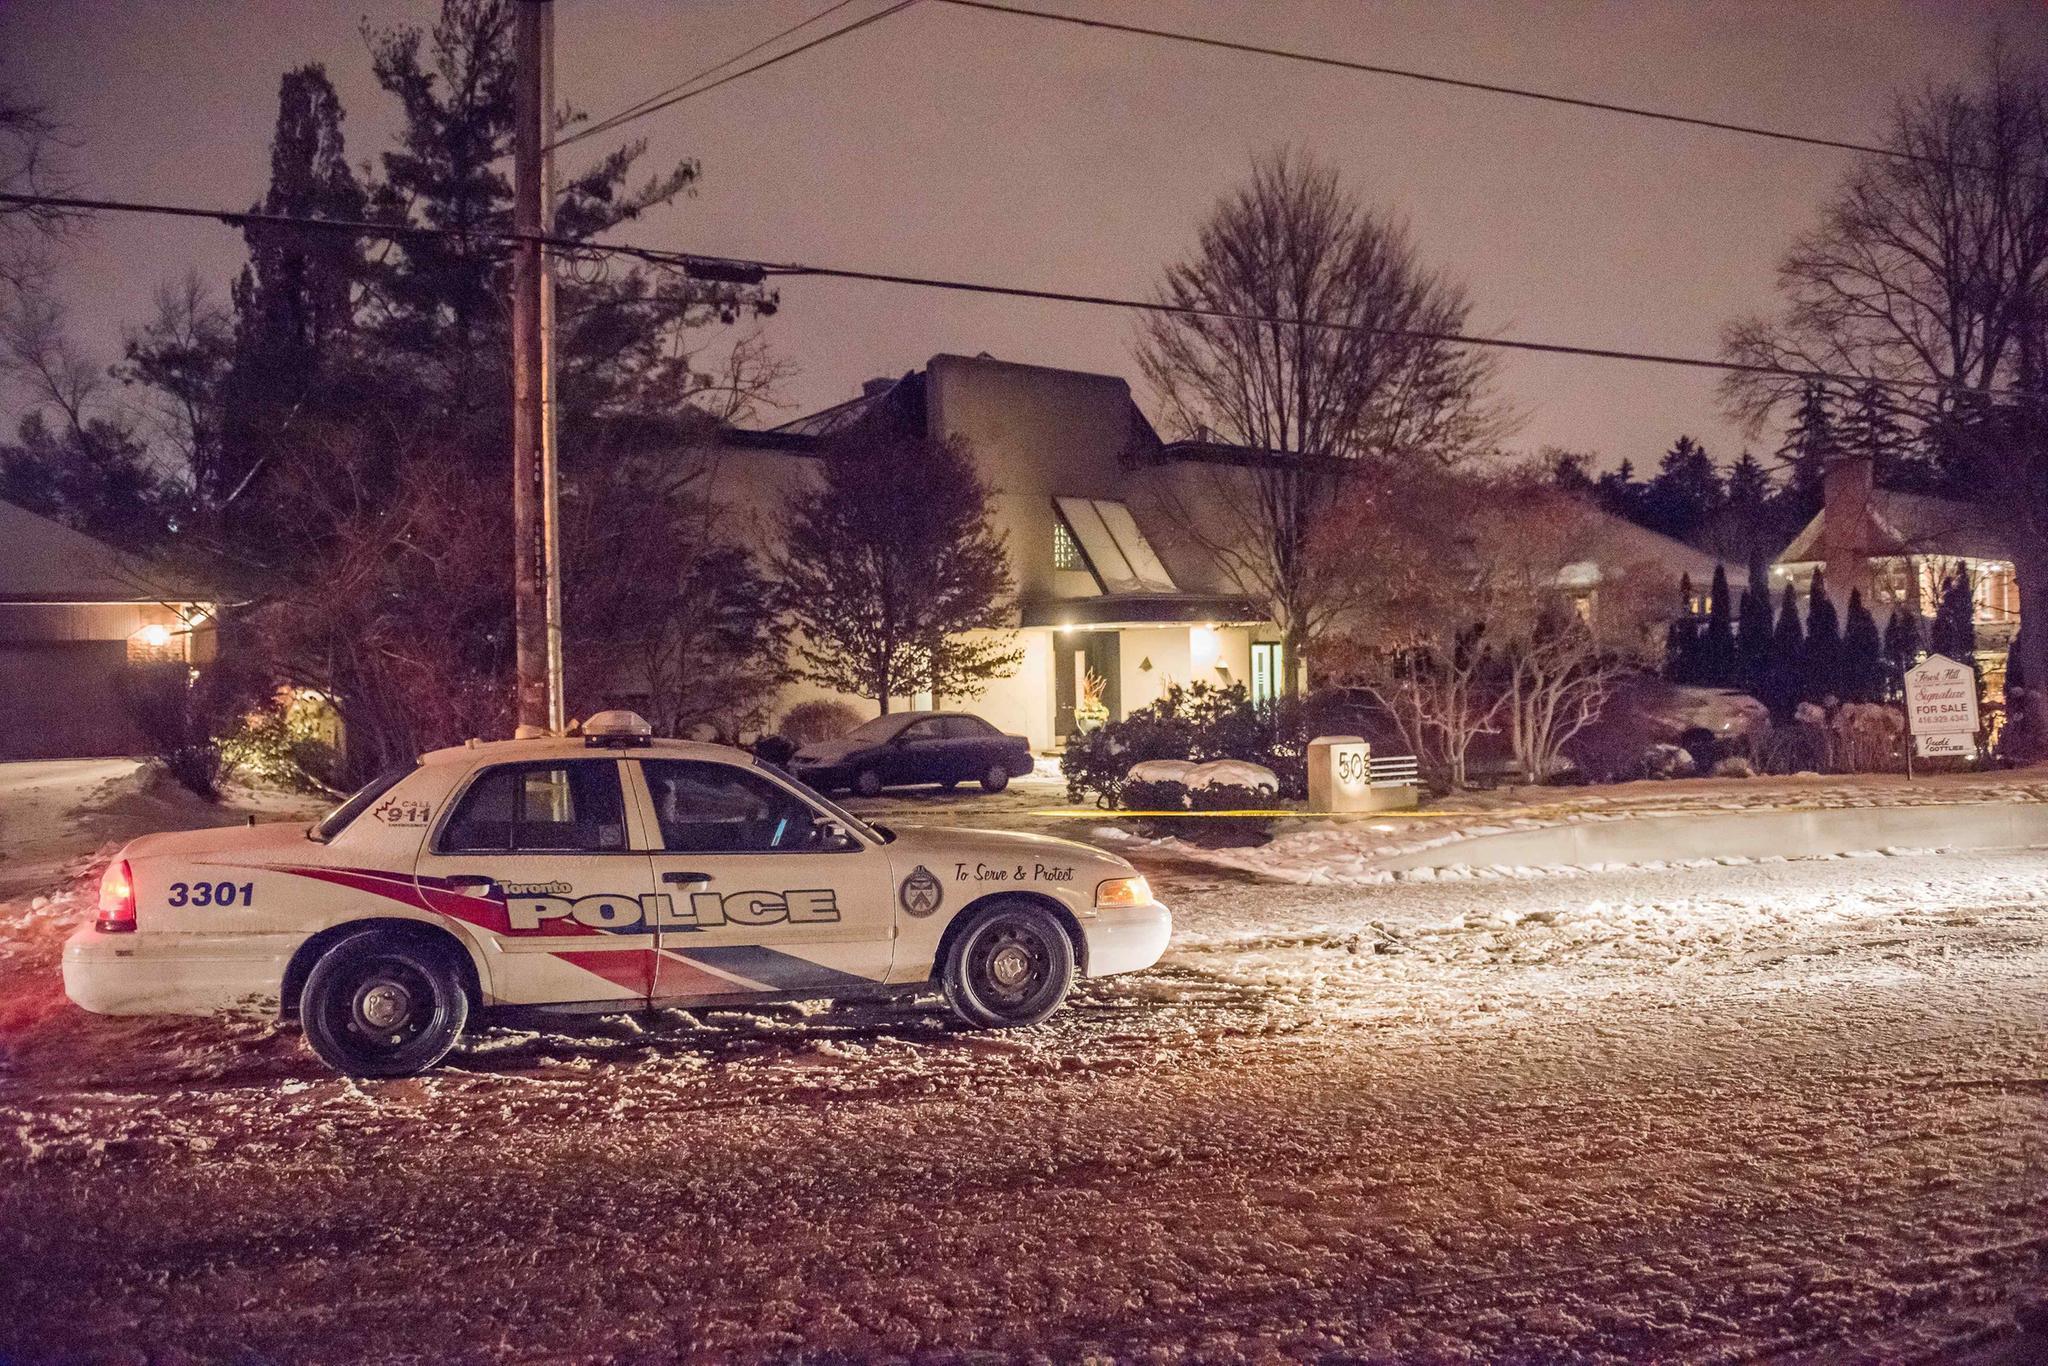 Kanada Pharma Milliardär Barry Sherman und Frau tot im Keller